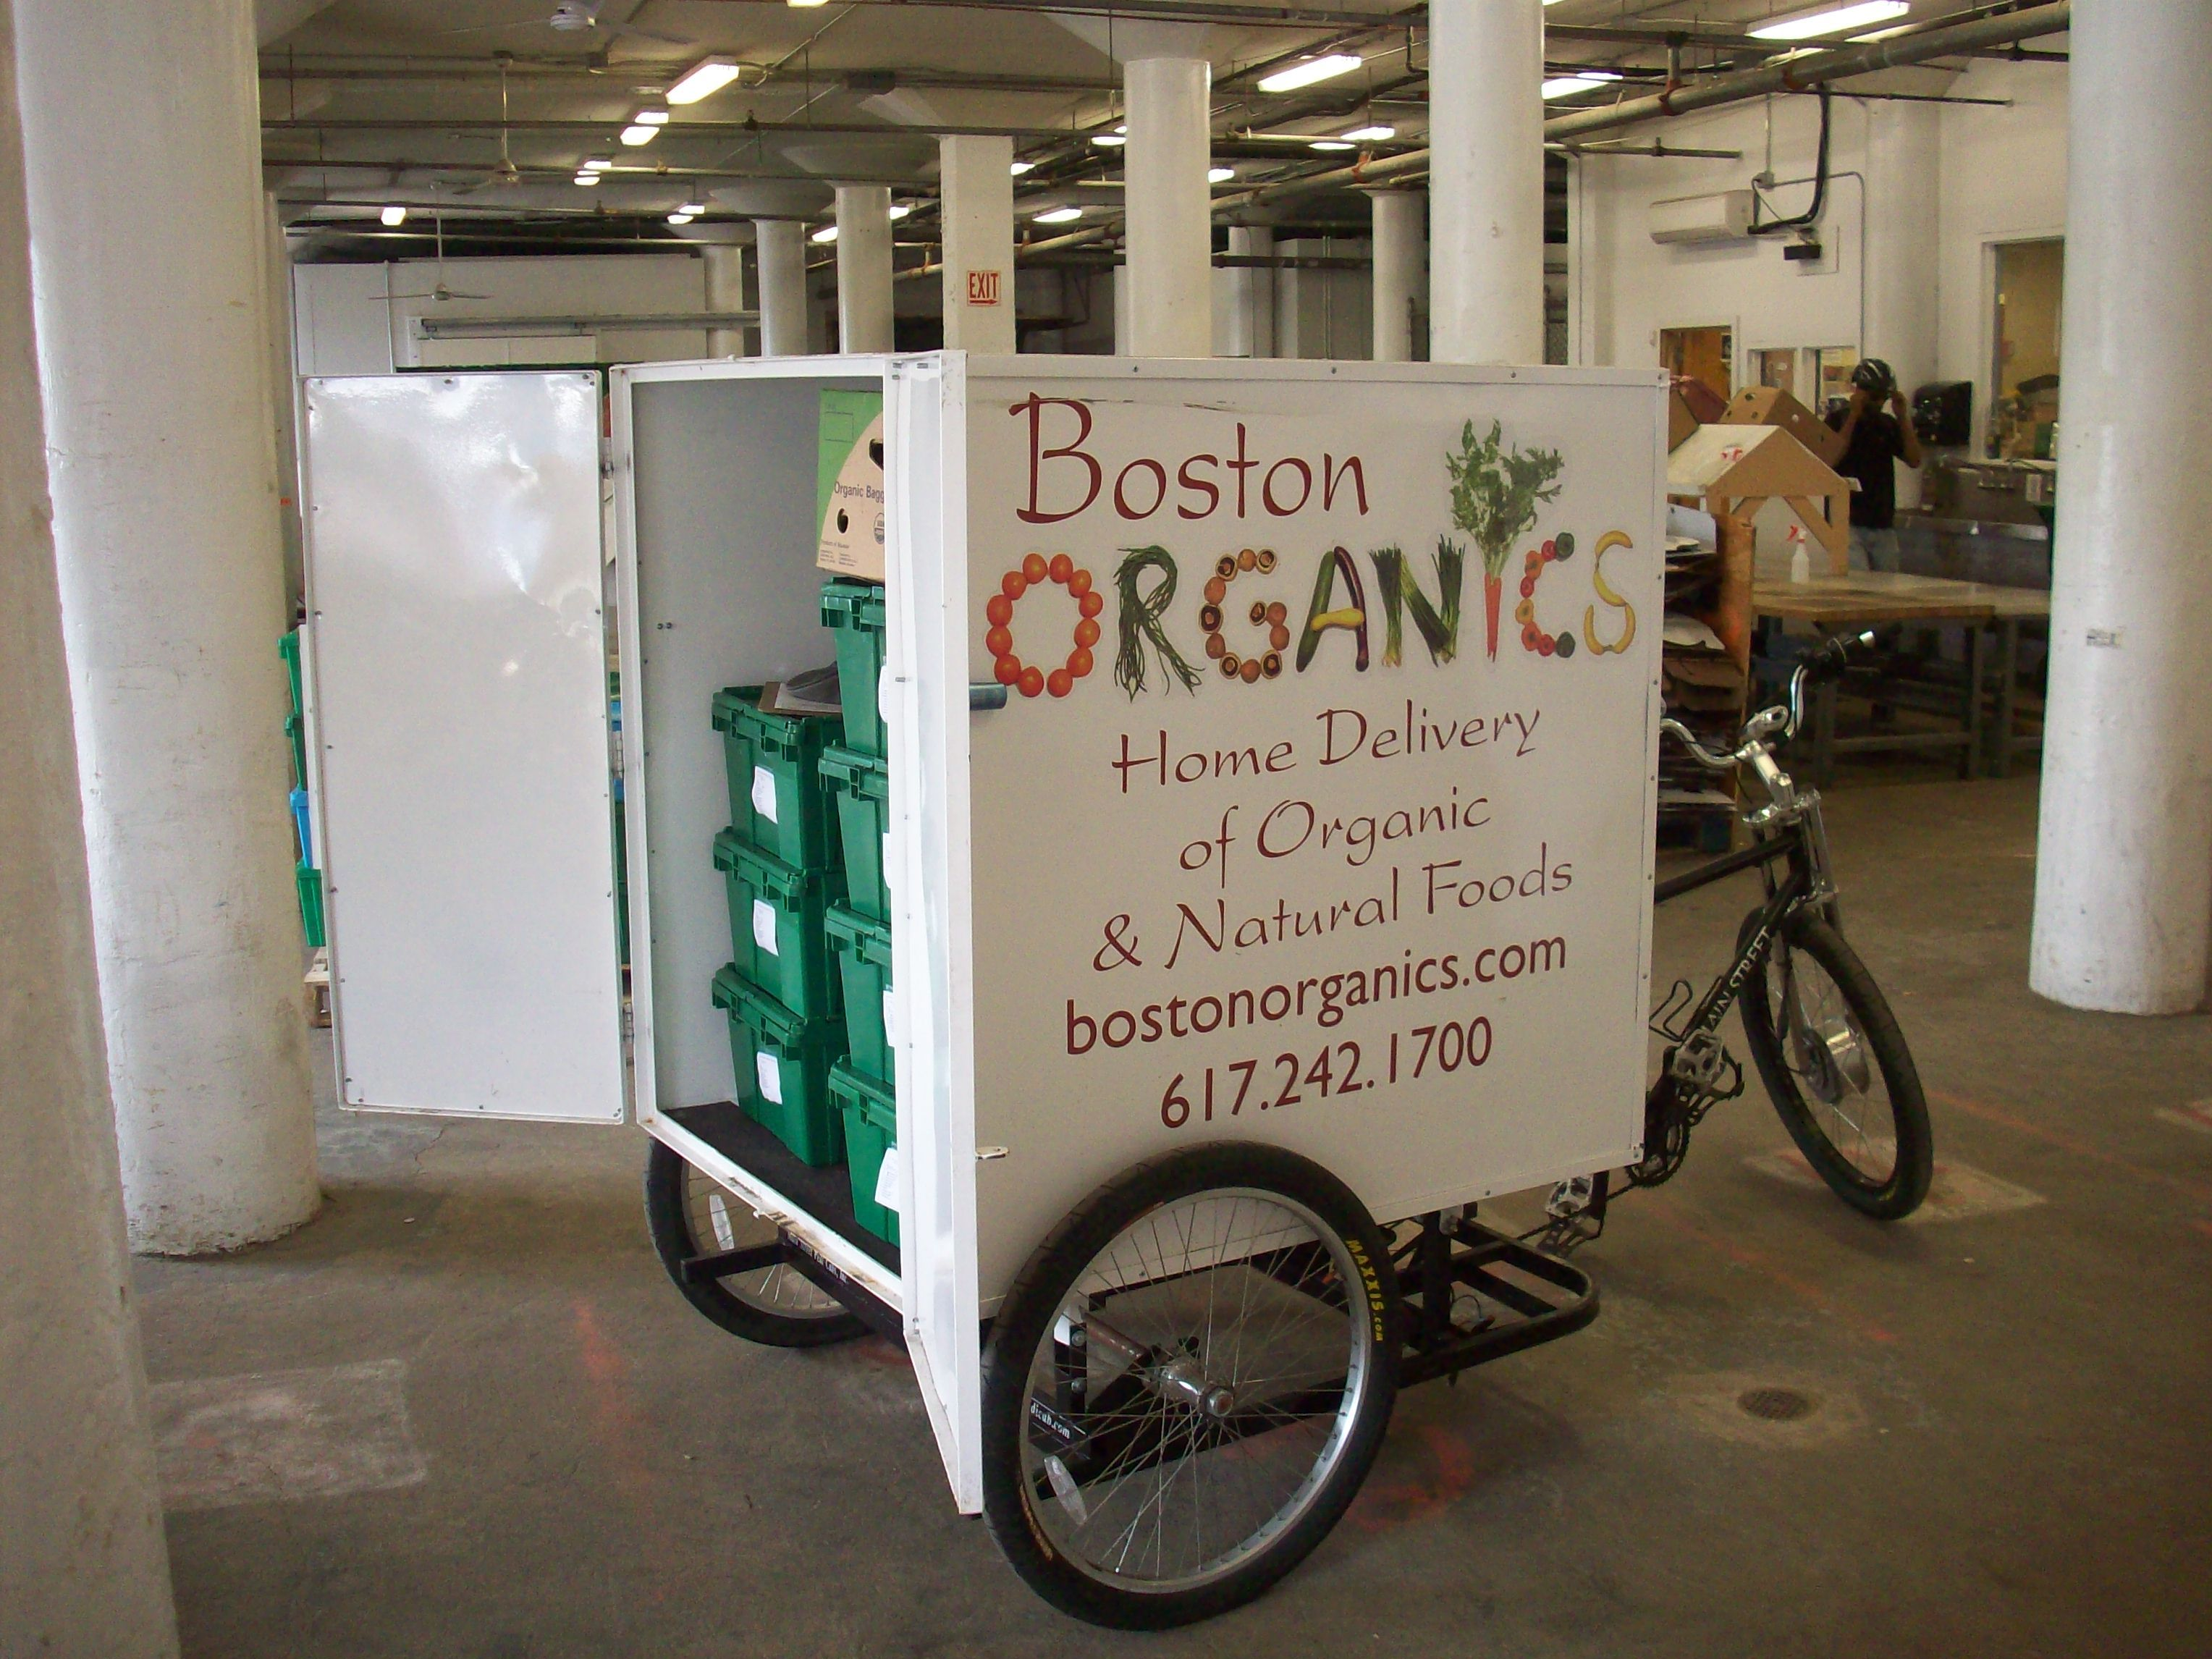 Cargo Bike pedalpower Cargo Bike pedalpower